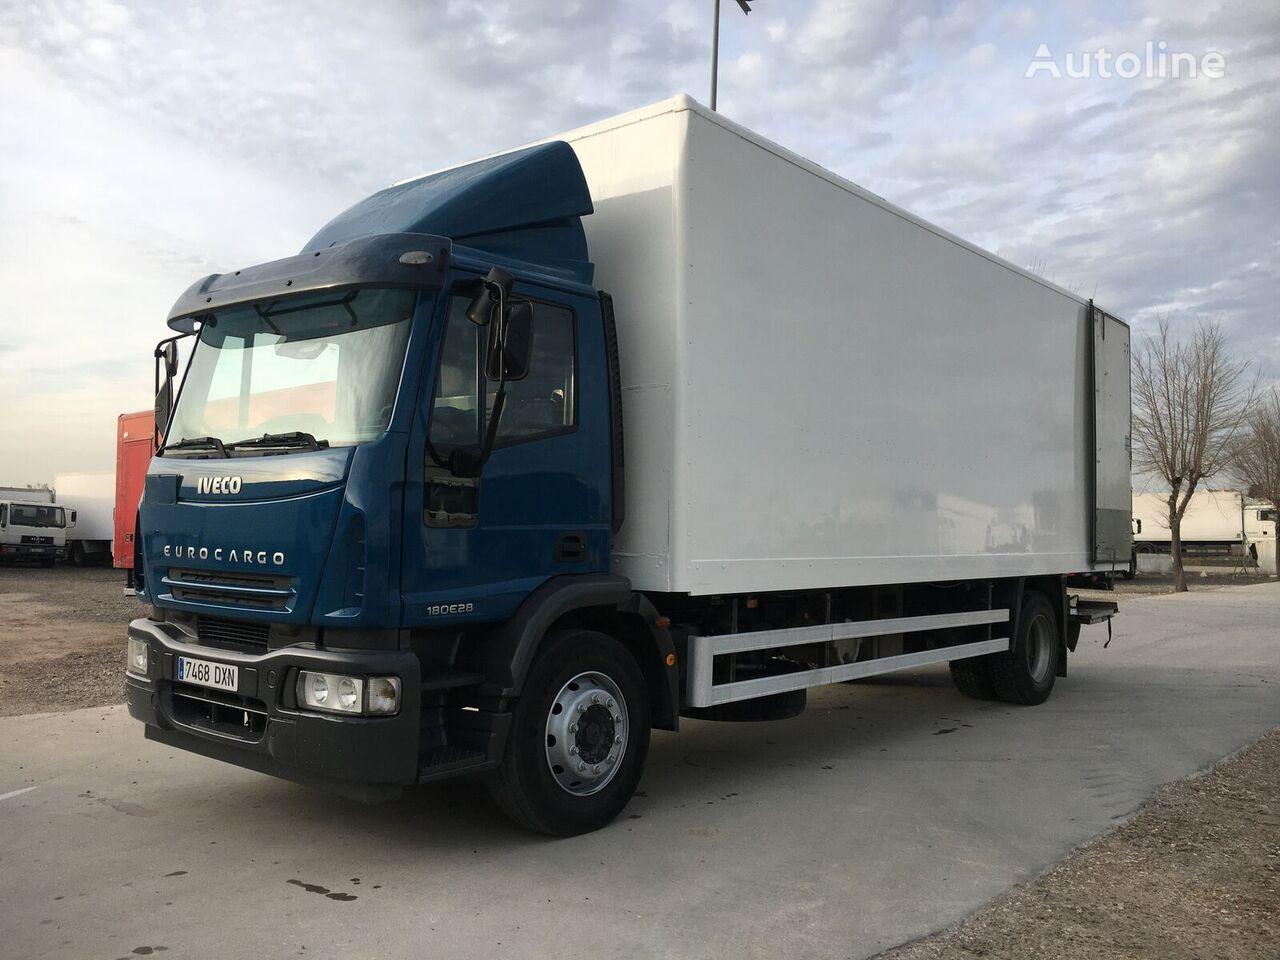 IVECO 280. FURGON 17 PALETS box truck